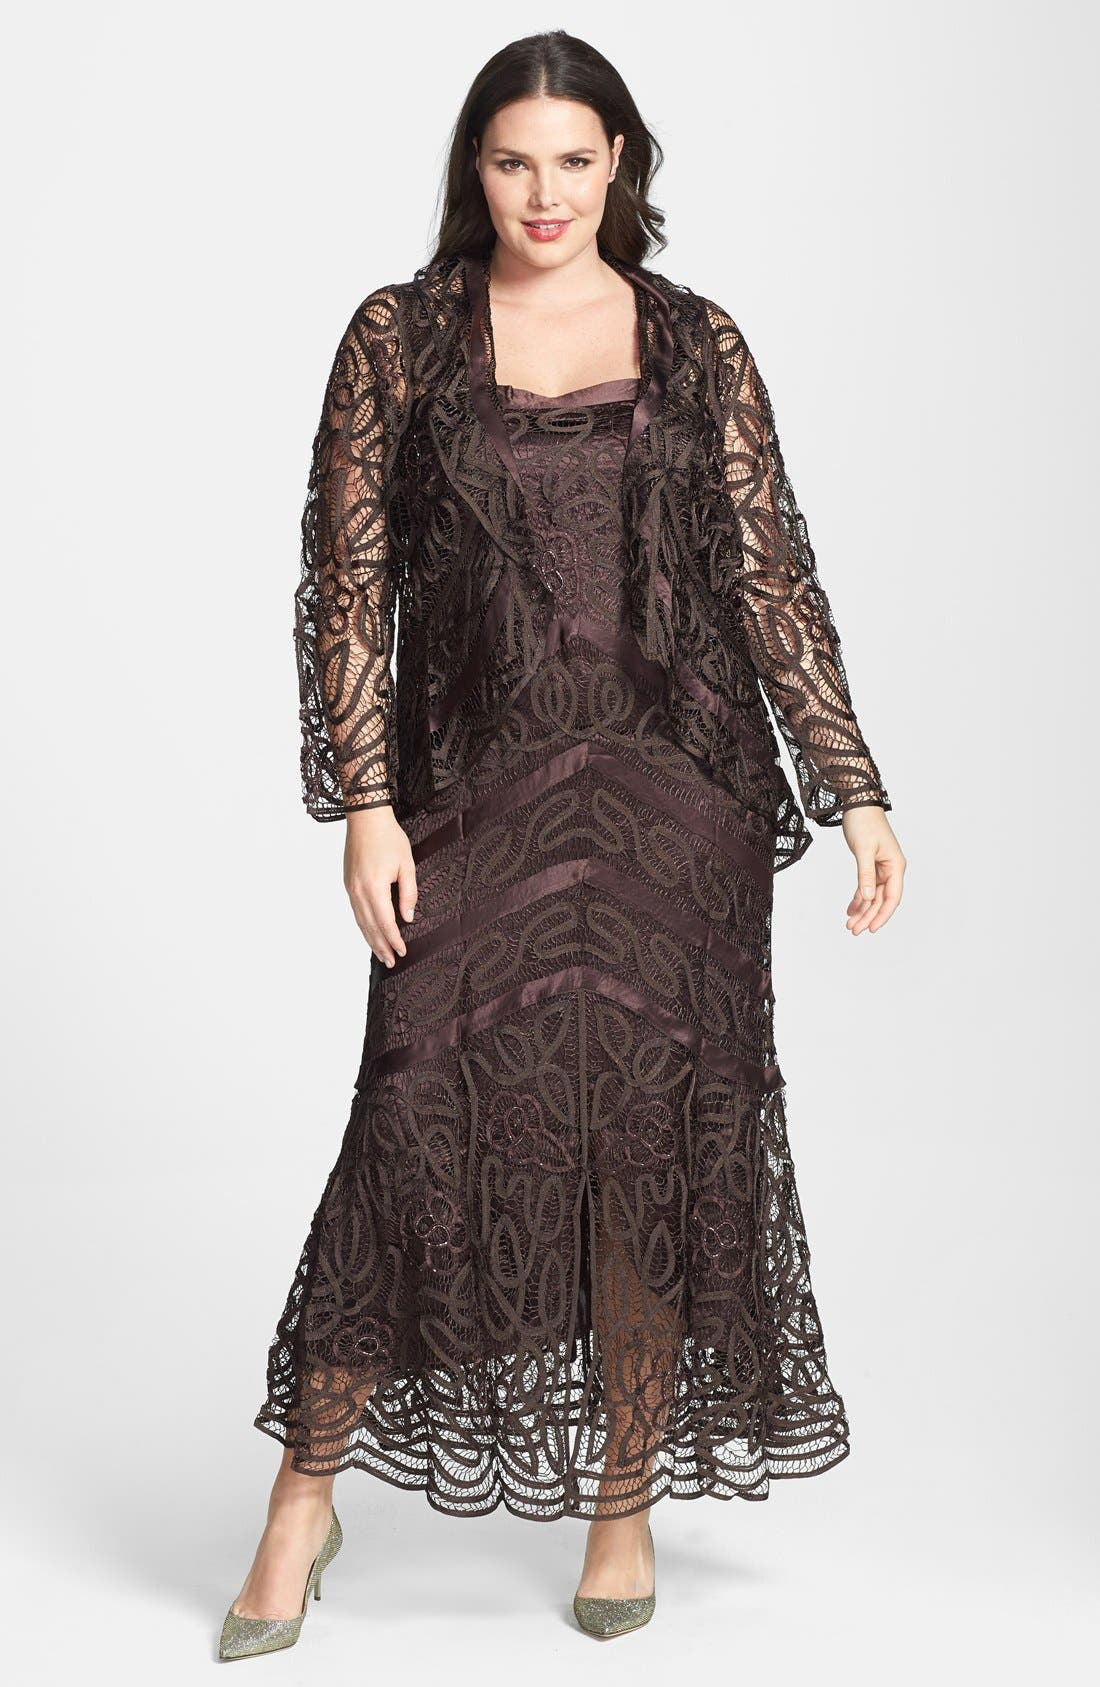 Alternate Image 1 Selected - Soulmates Bead Crochet Dress & Jacket (Plus)